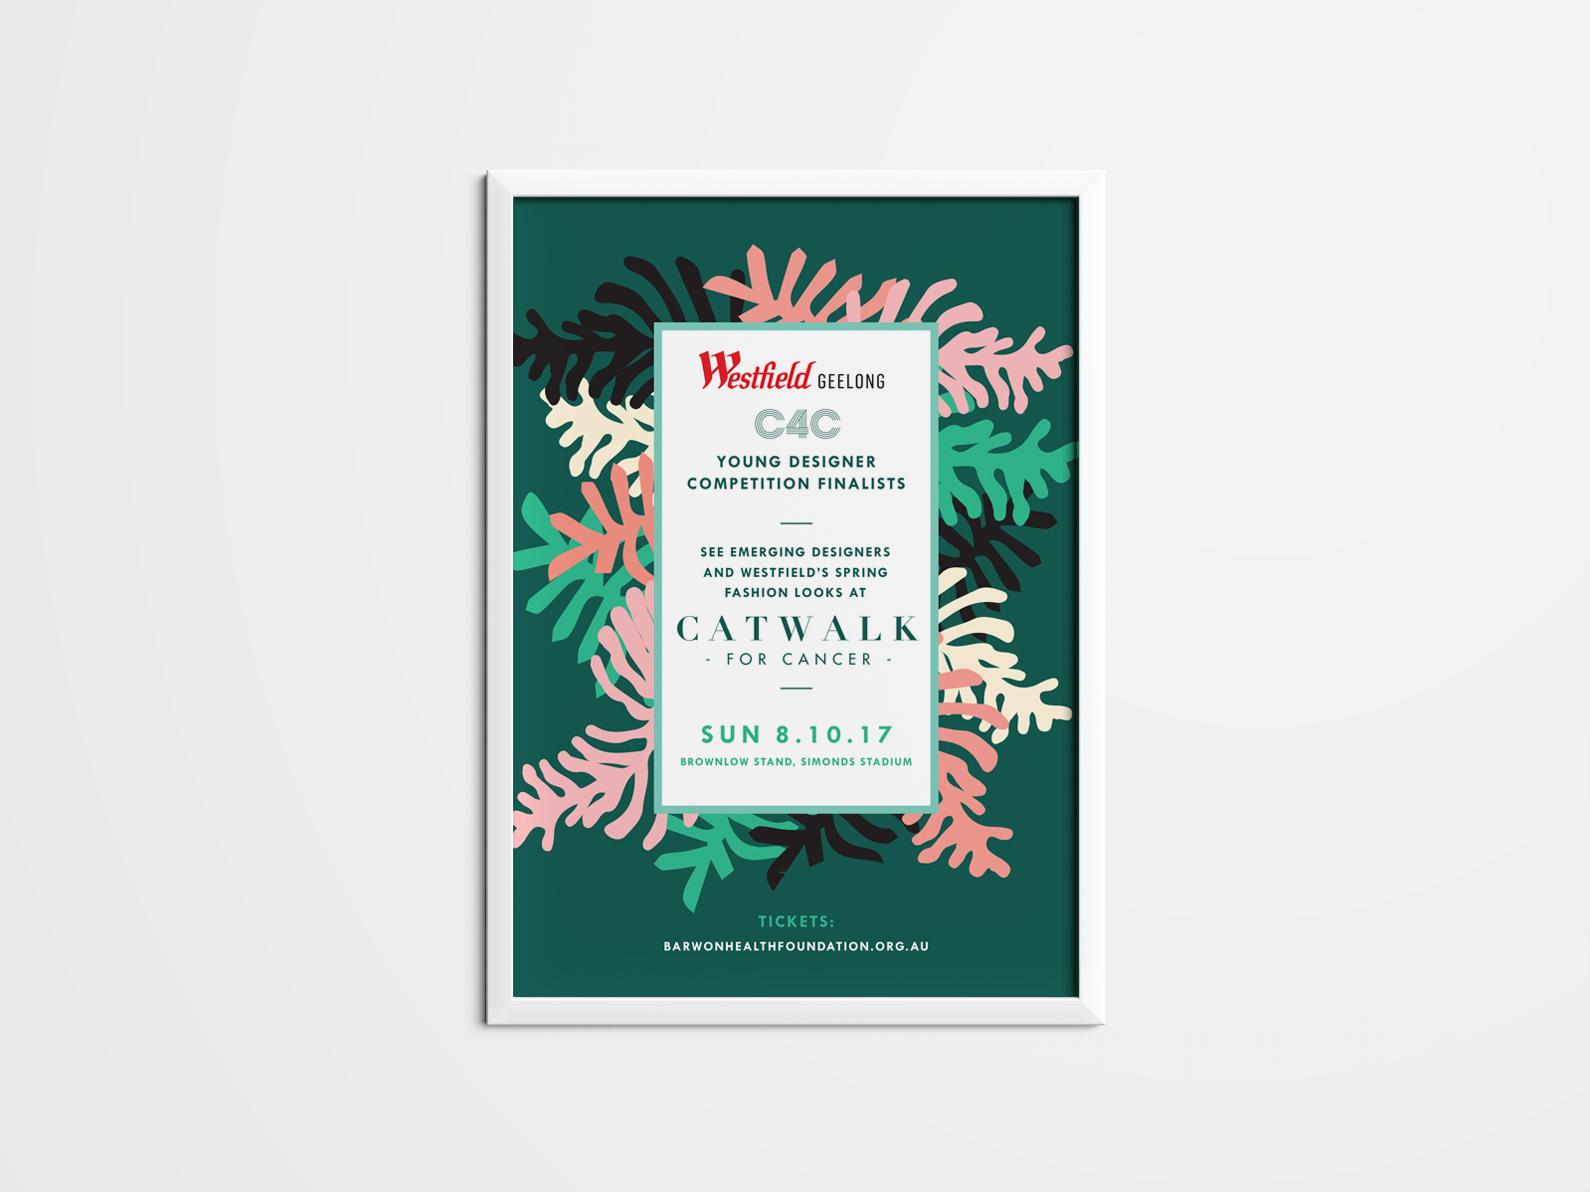 Studio-Mimi-MOon-Catwalk-for-Cancer-Event-Design-&-Identity-&-Publication-Design-Poster-A3-2